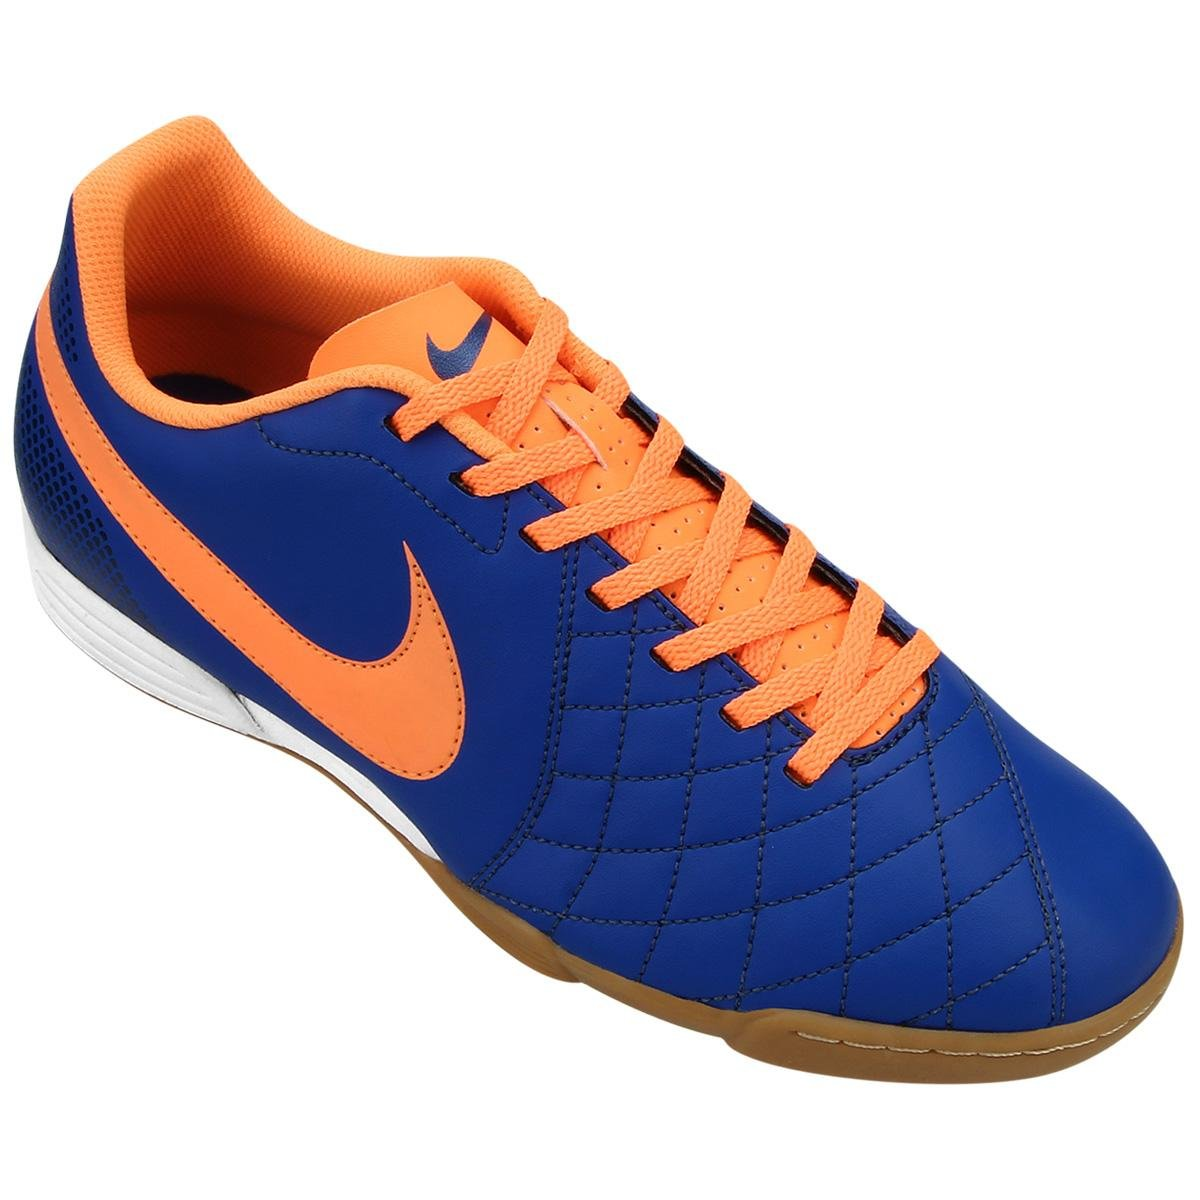 Chuteira Nike Flare IC - Compre Agora  35bb253a49523